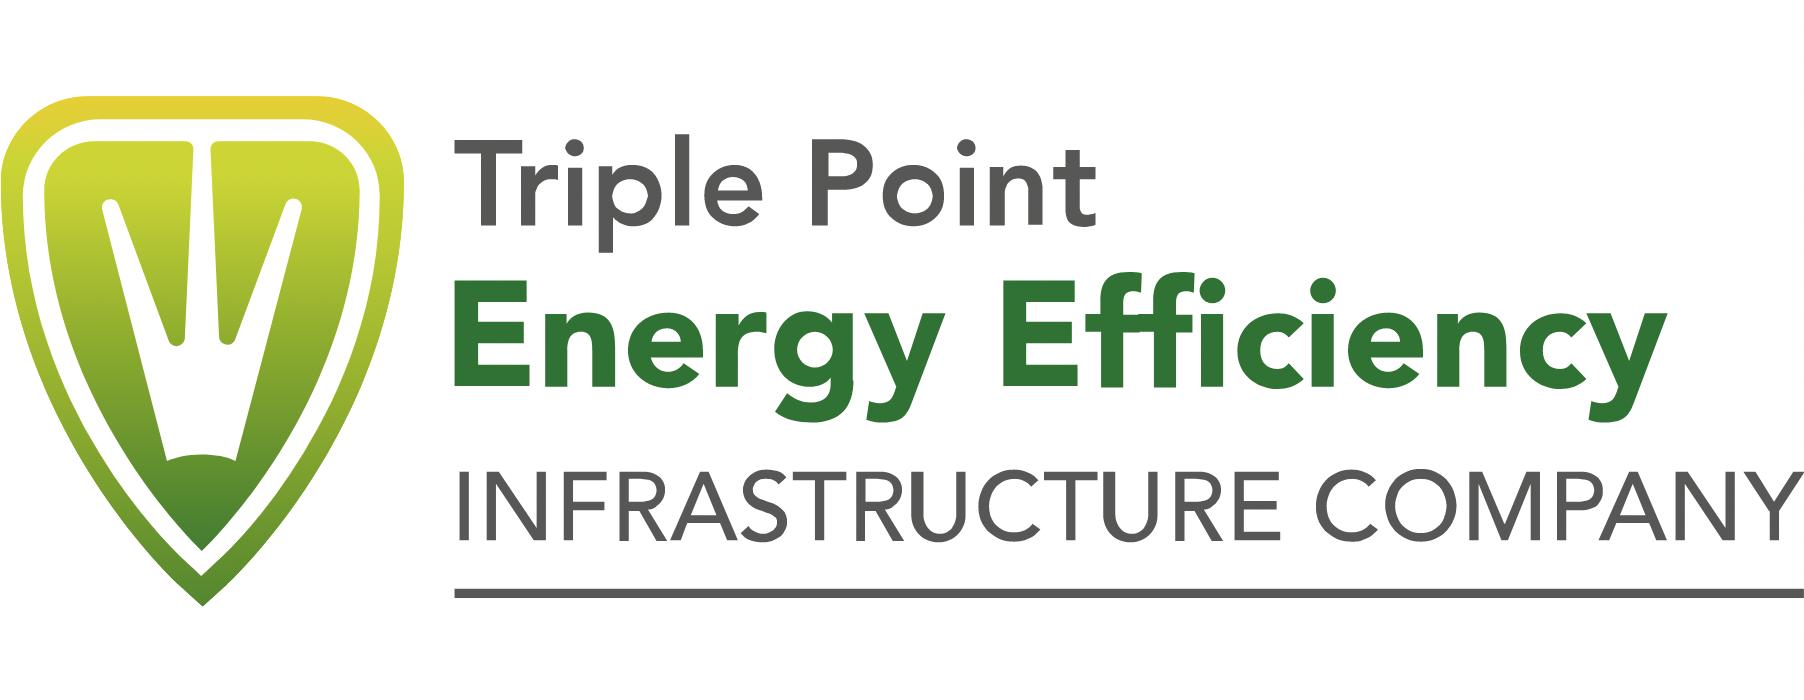 TRIPLE POINT ENERGY EFFICIENCY INFRASTRUCTURE COMPANY PLC Logo